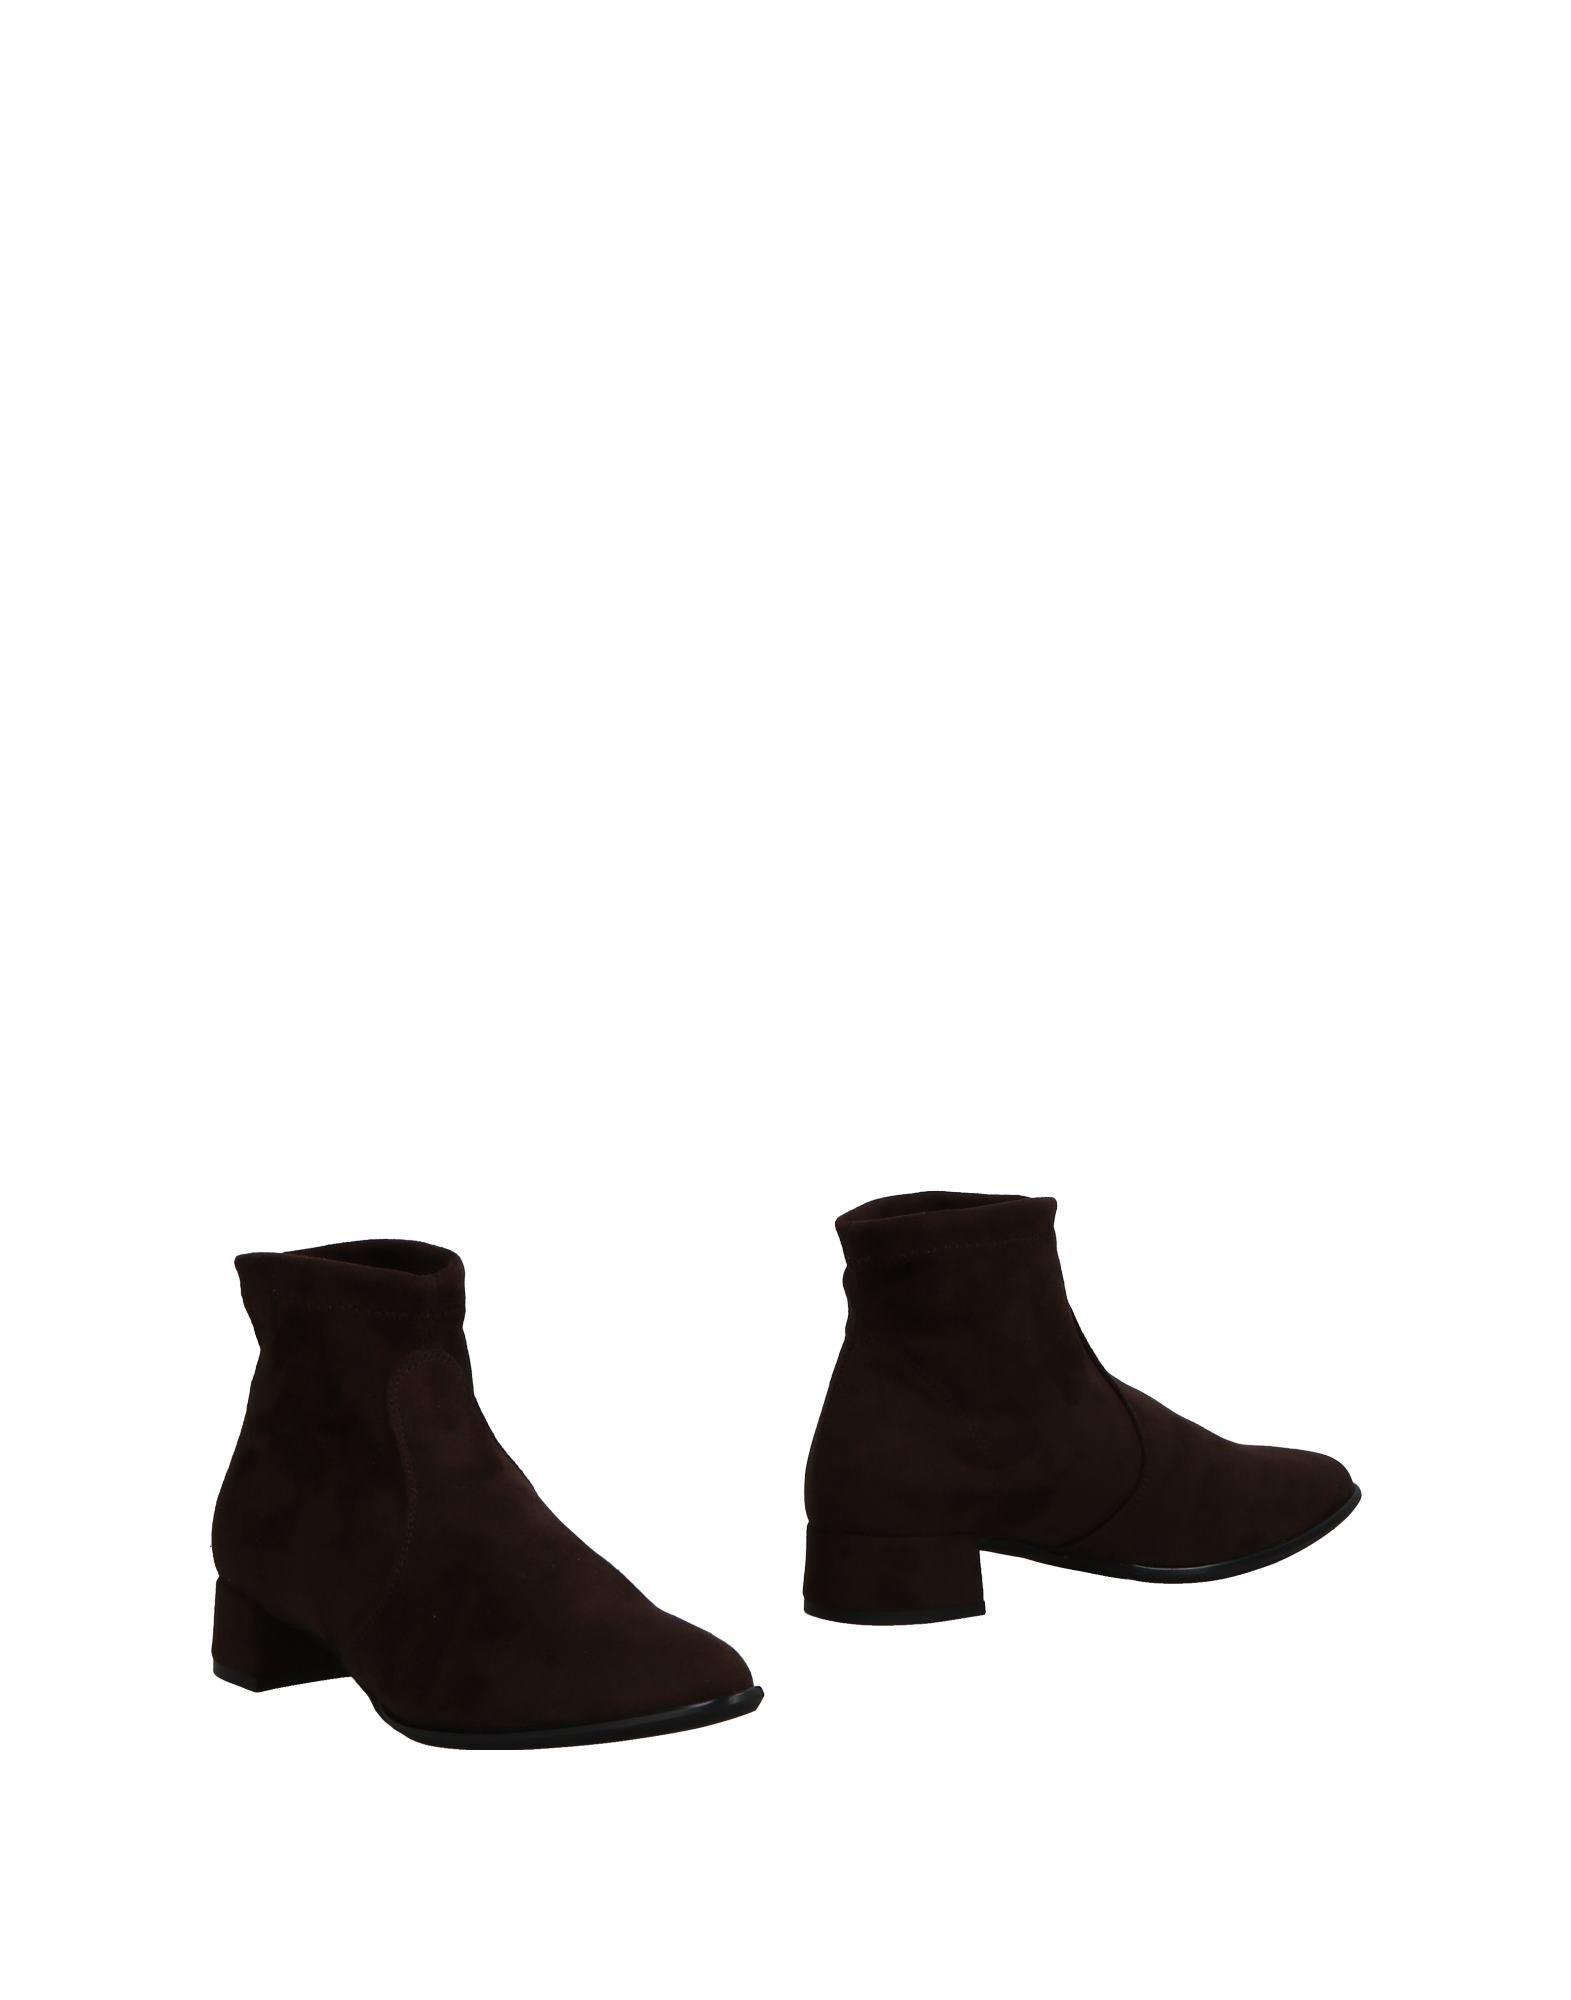 Nr 11504890HK Rapisardi Stiefelette Damen  11504890HK Nr Gute Qualität beliebte Schuhe 9fd5a7